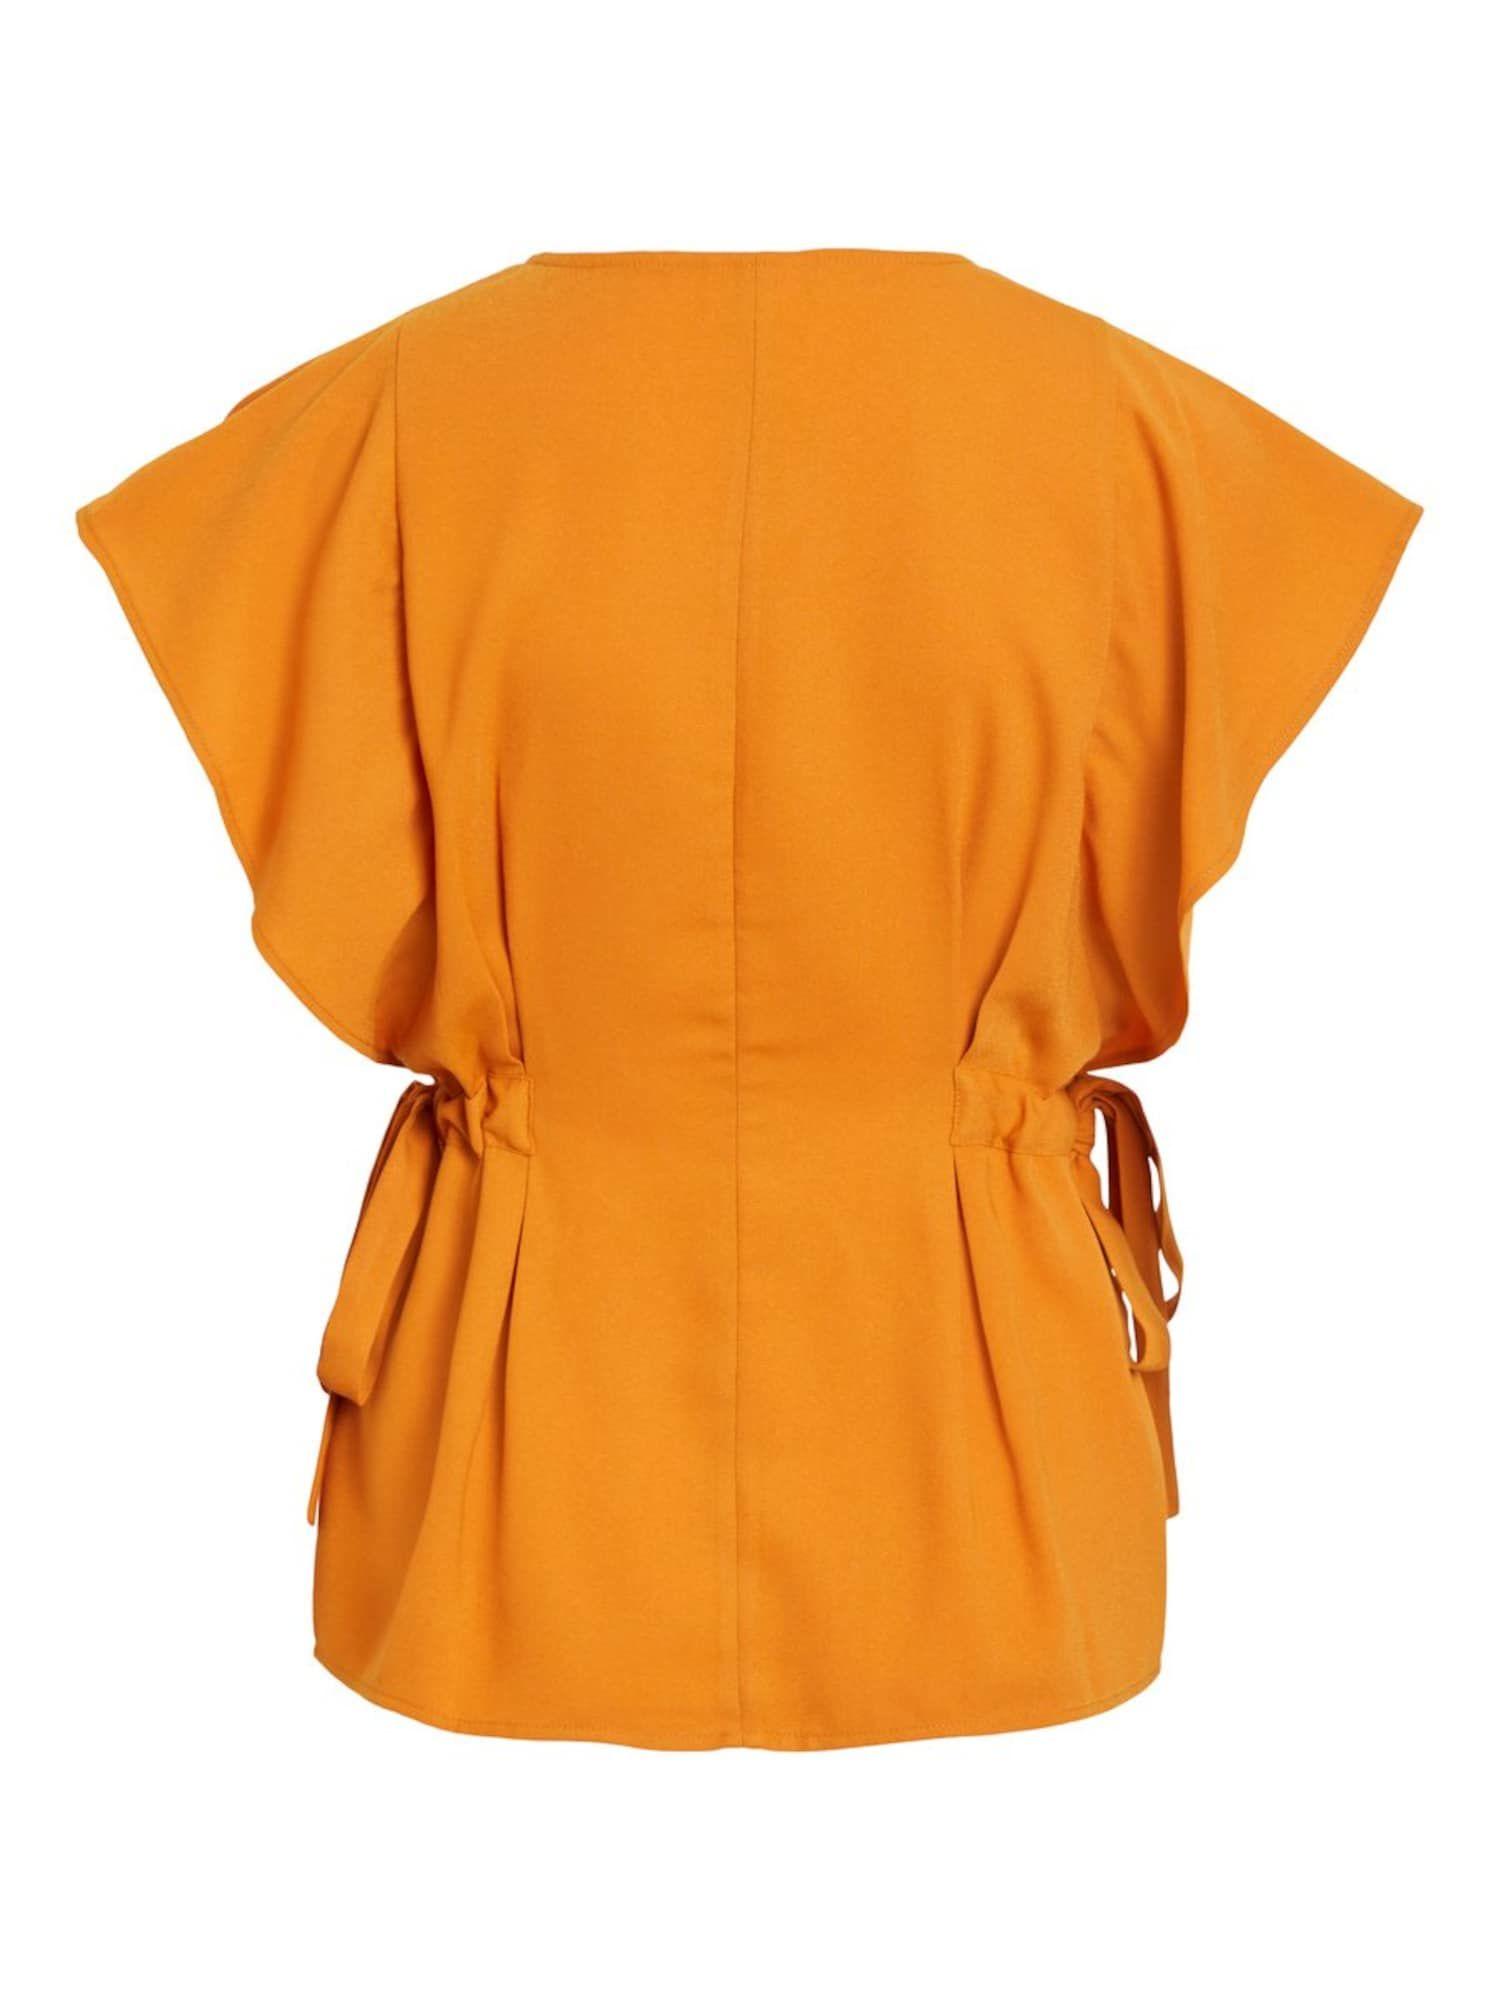 Blusen & Tuniken | Damenblusen und Tuniken entdecken| VILA